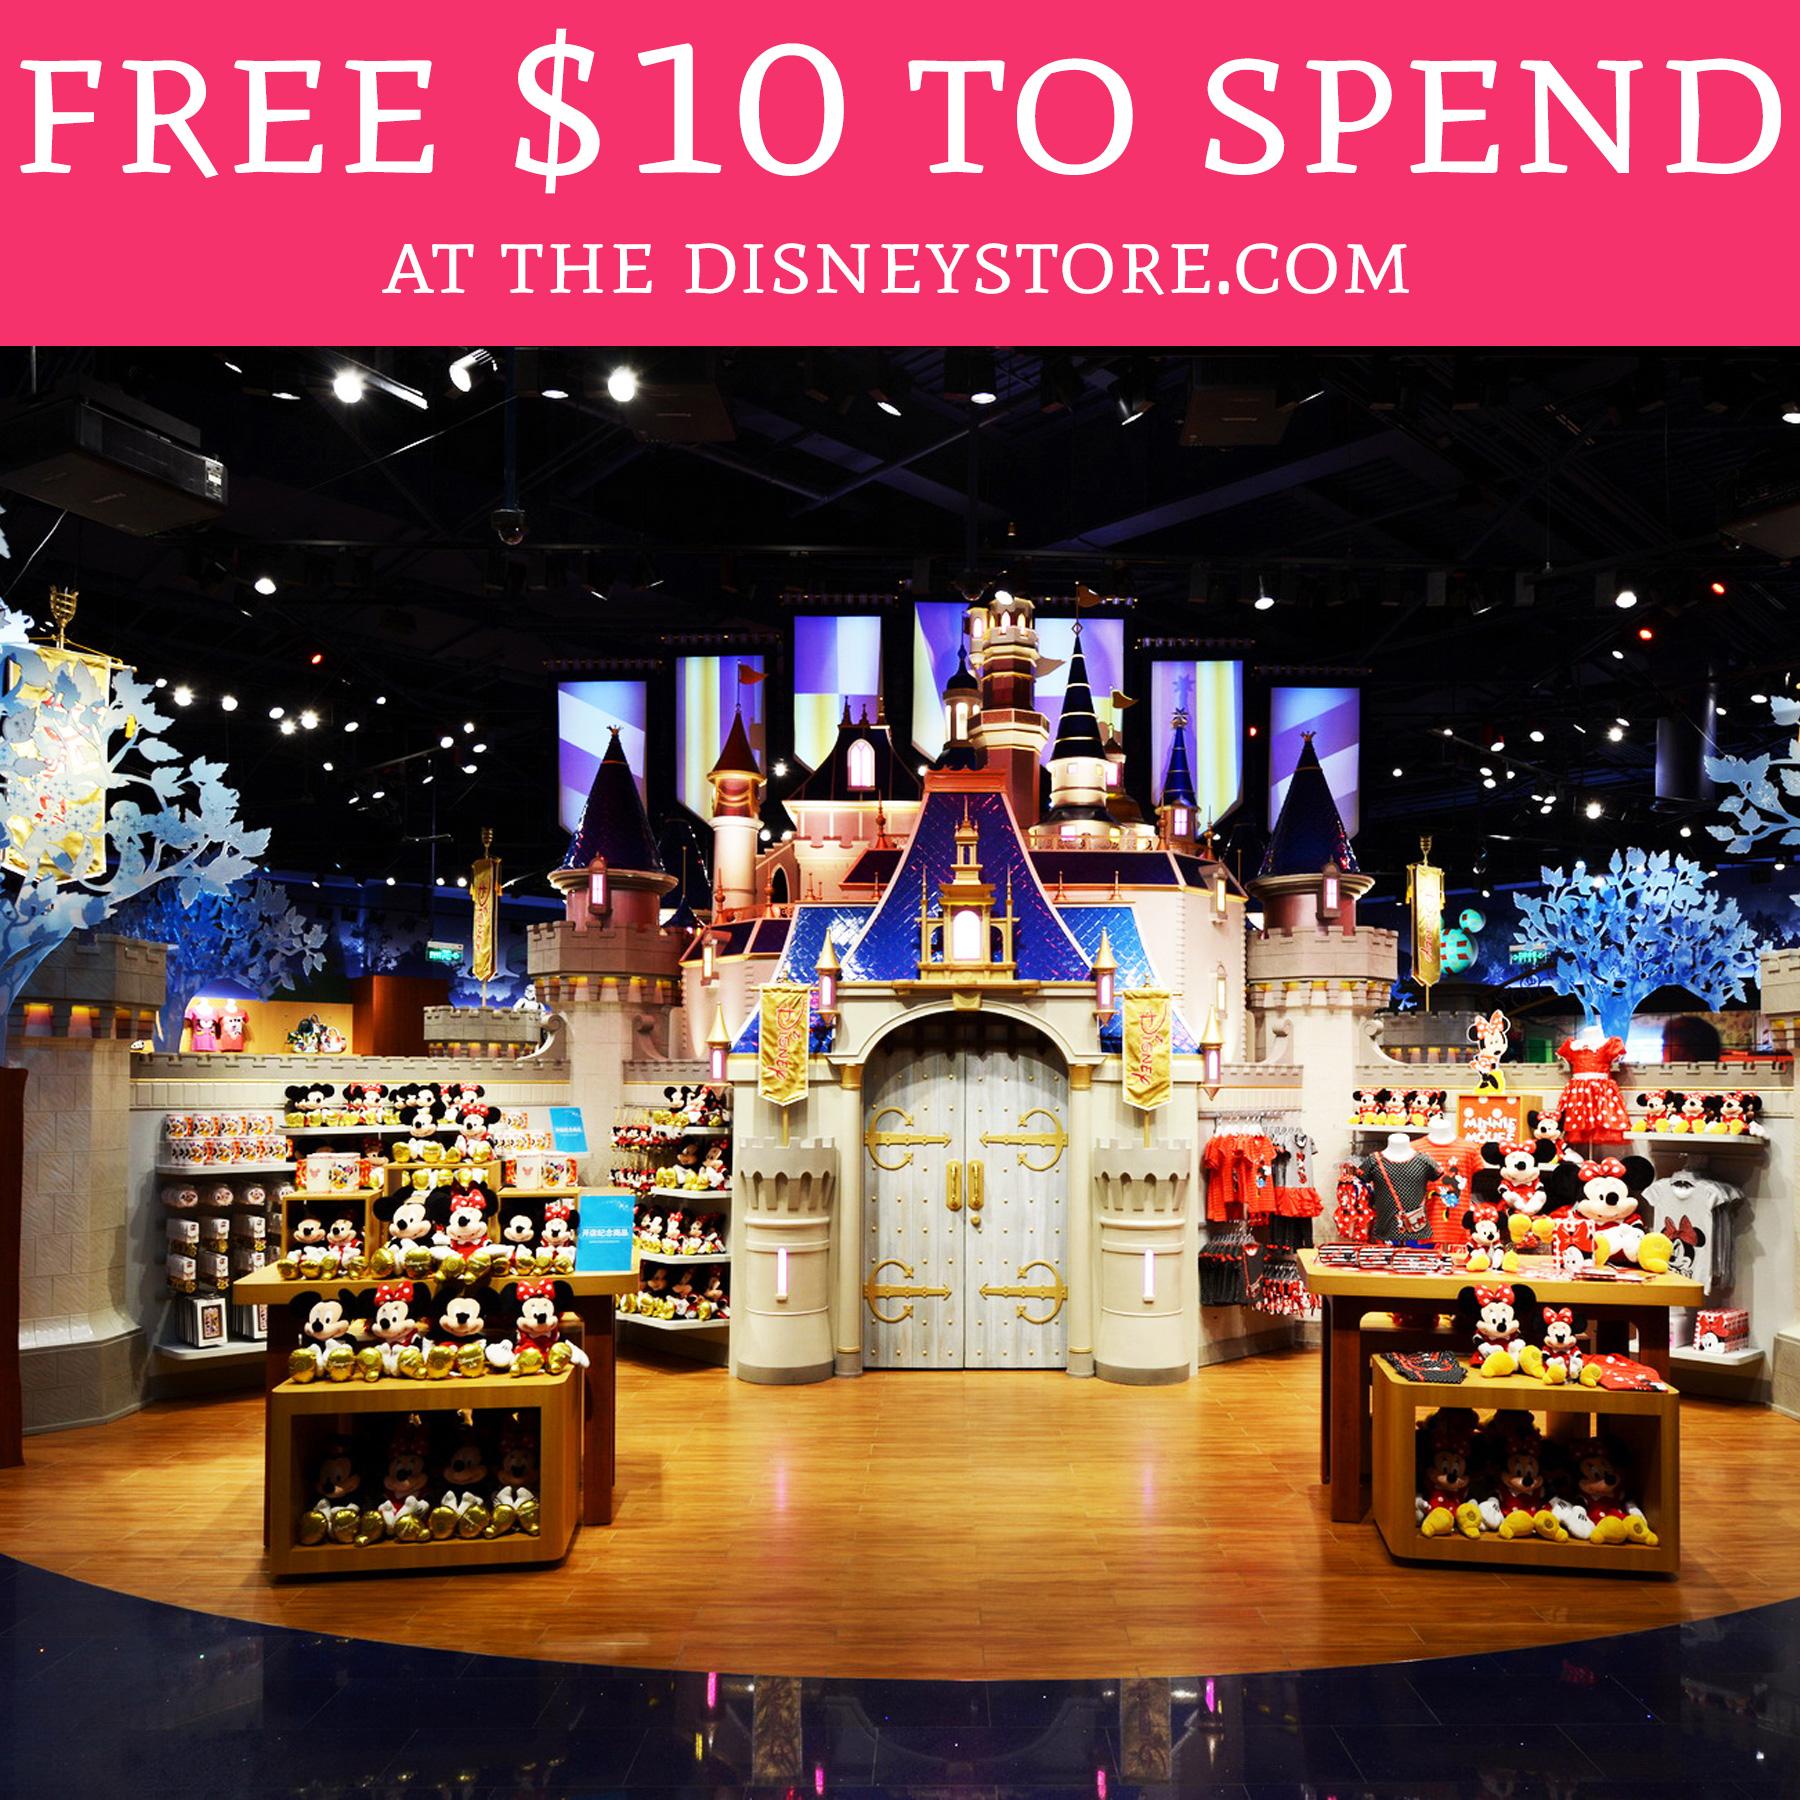 Hot Free 10 To Spend At The Disneystorecom -9816